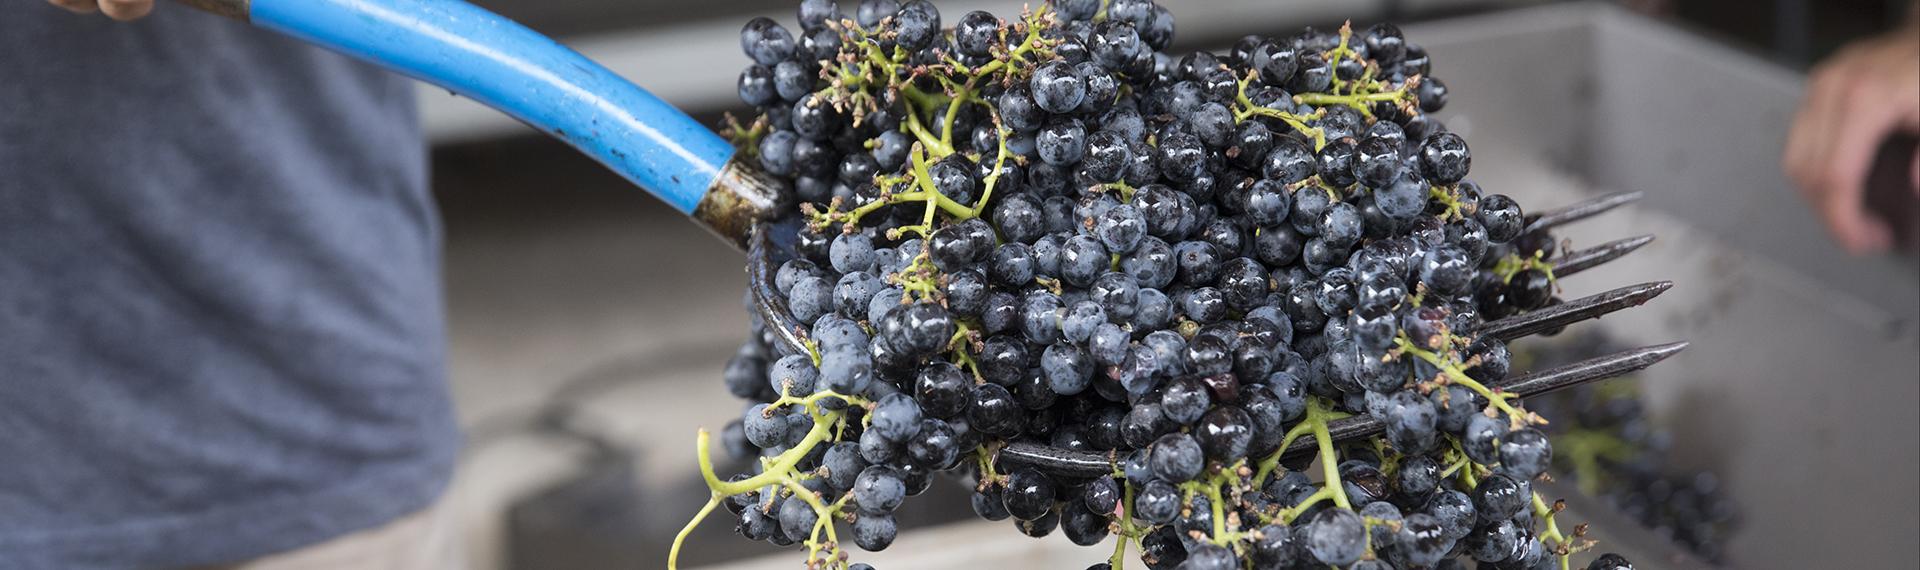 Growing Georgia Wine